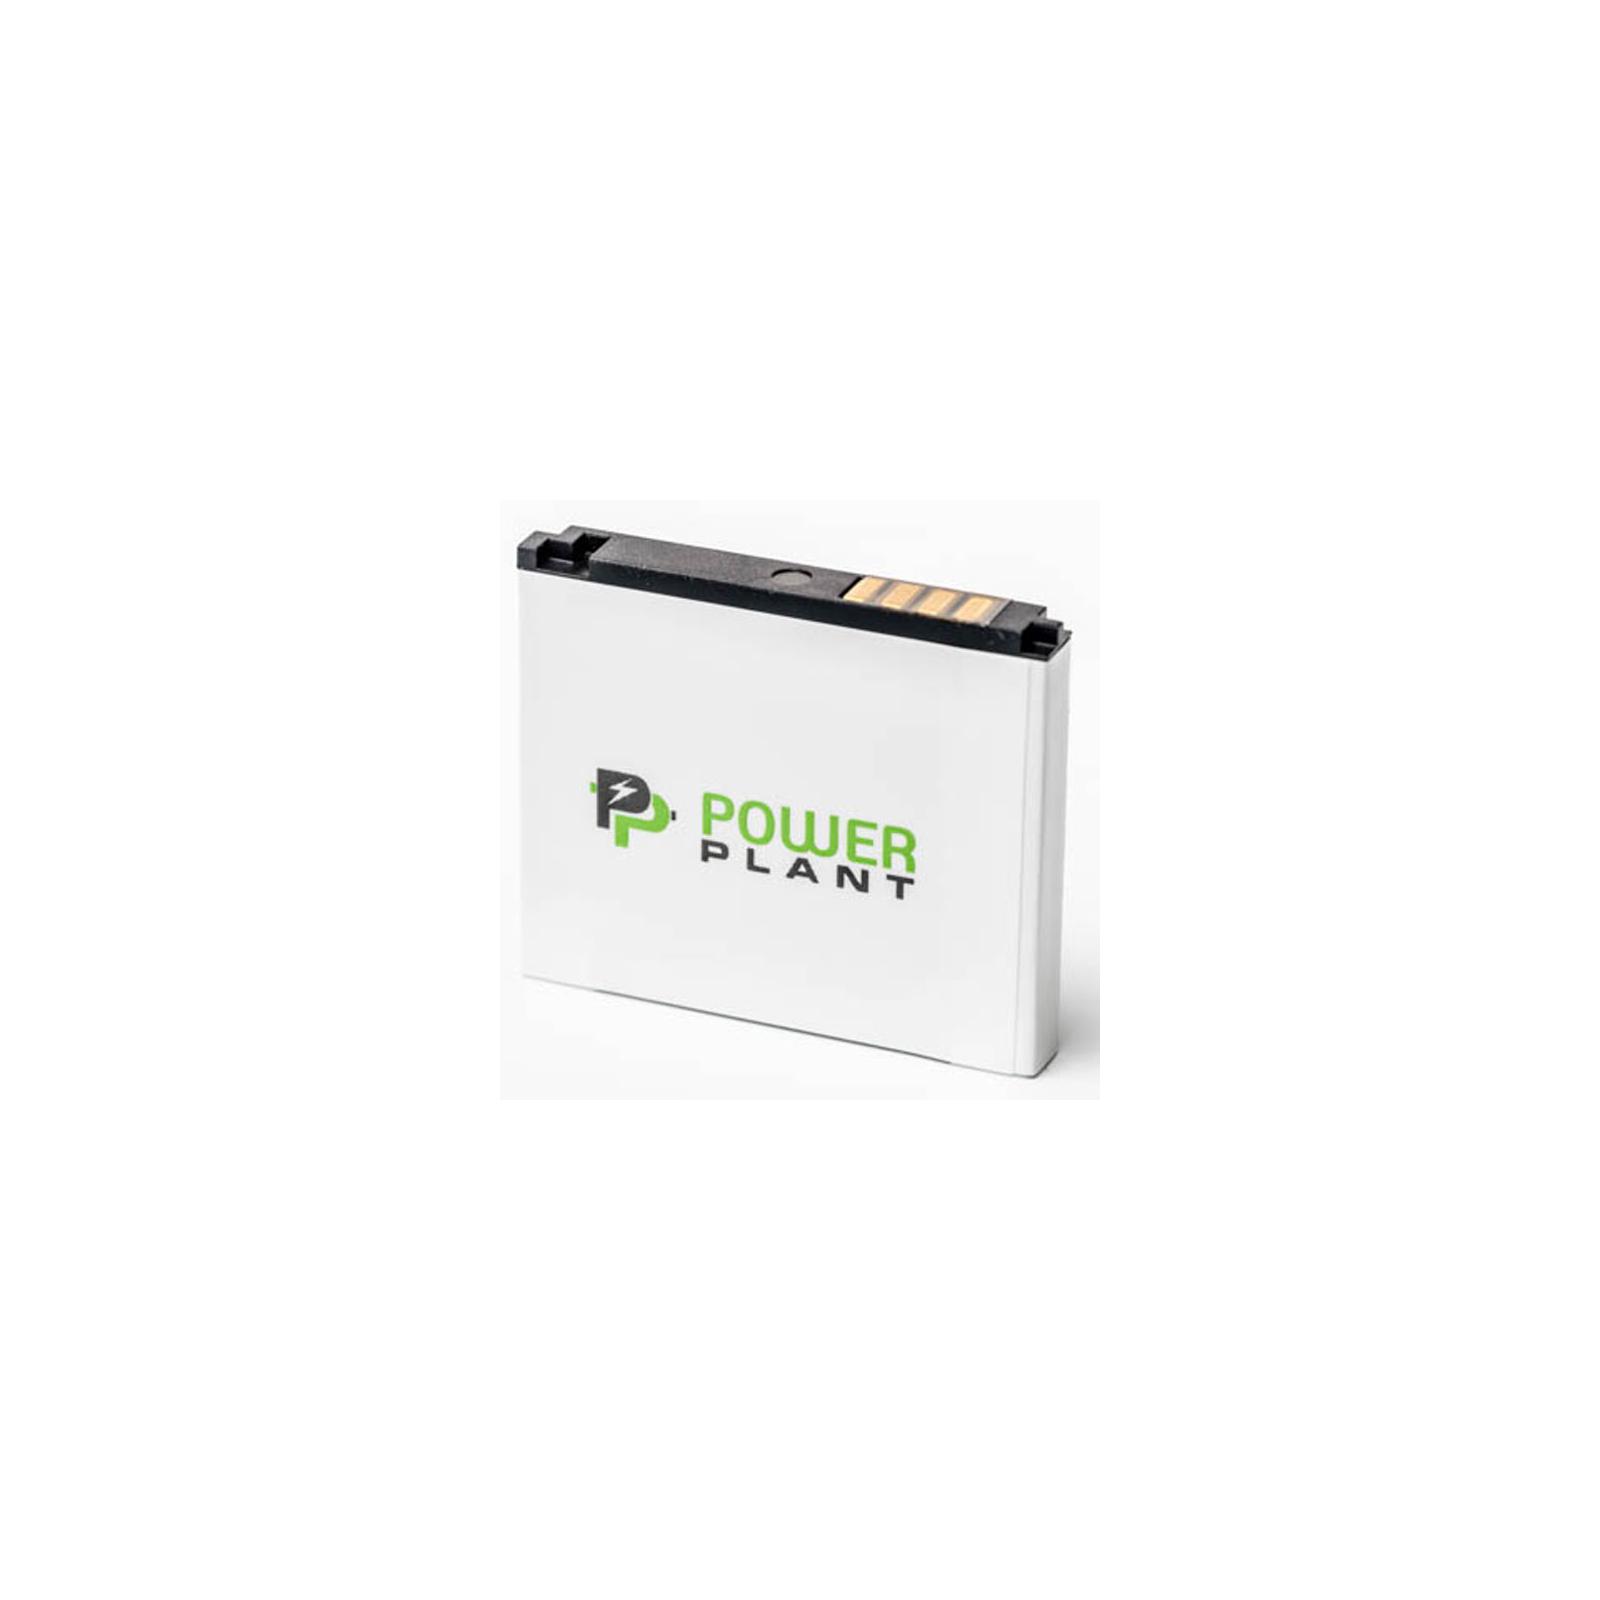 Аккумуляторная батарея PowerPlant LG KP500 (DV00DV6166) изображение 2